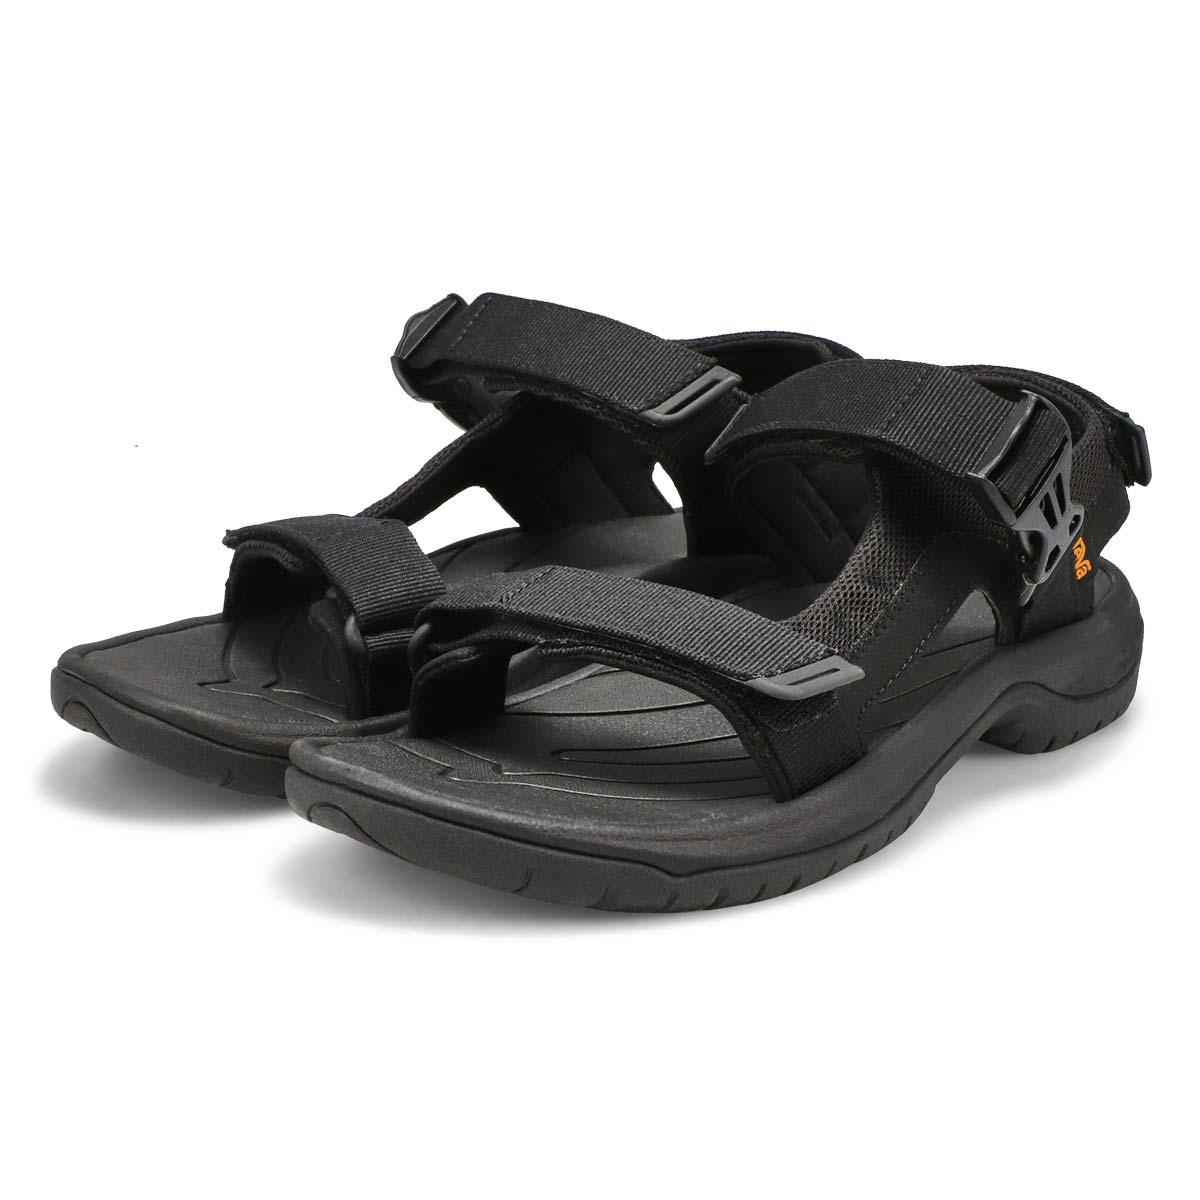 Sandales sport TANWAY, noir, femmes